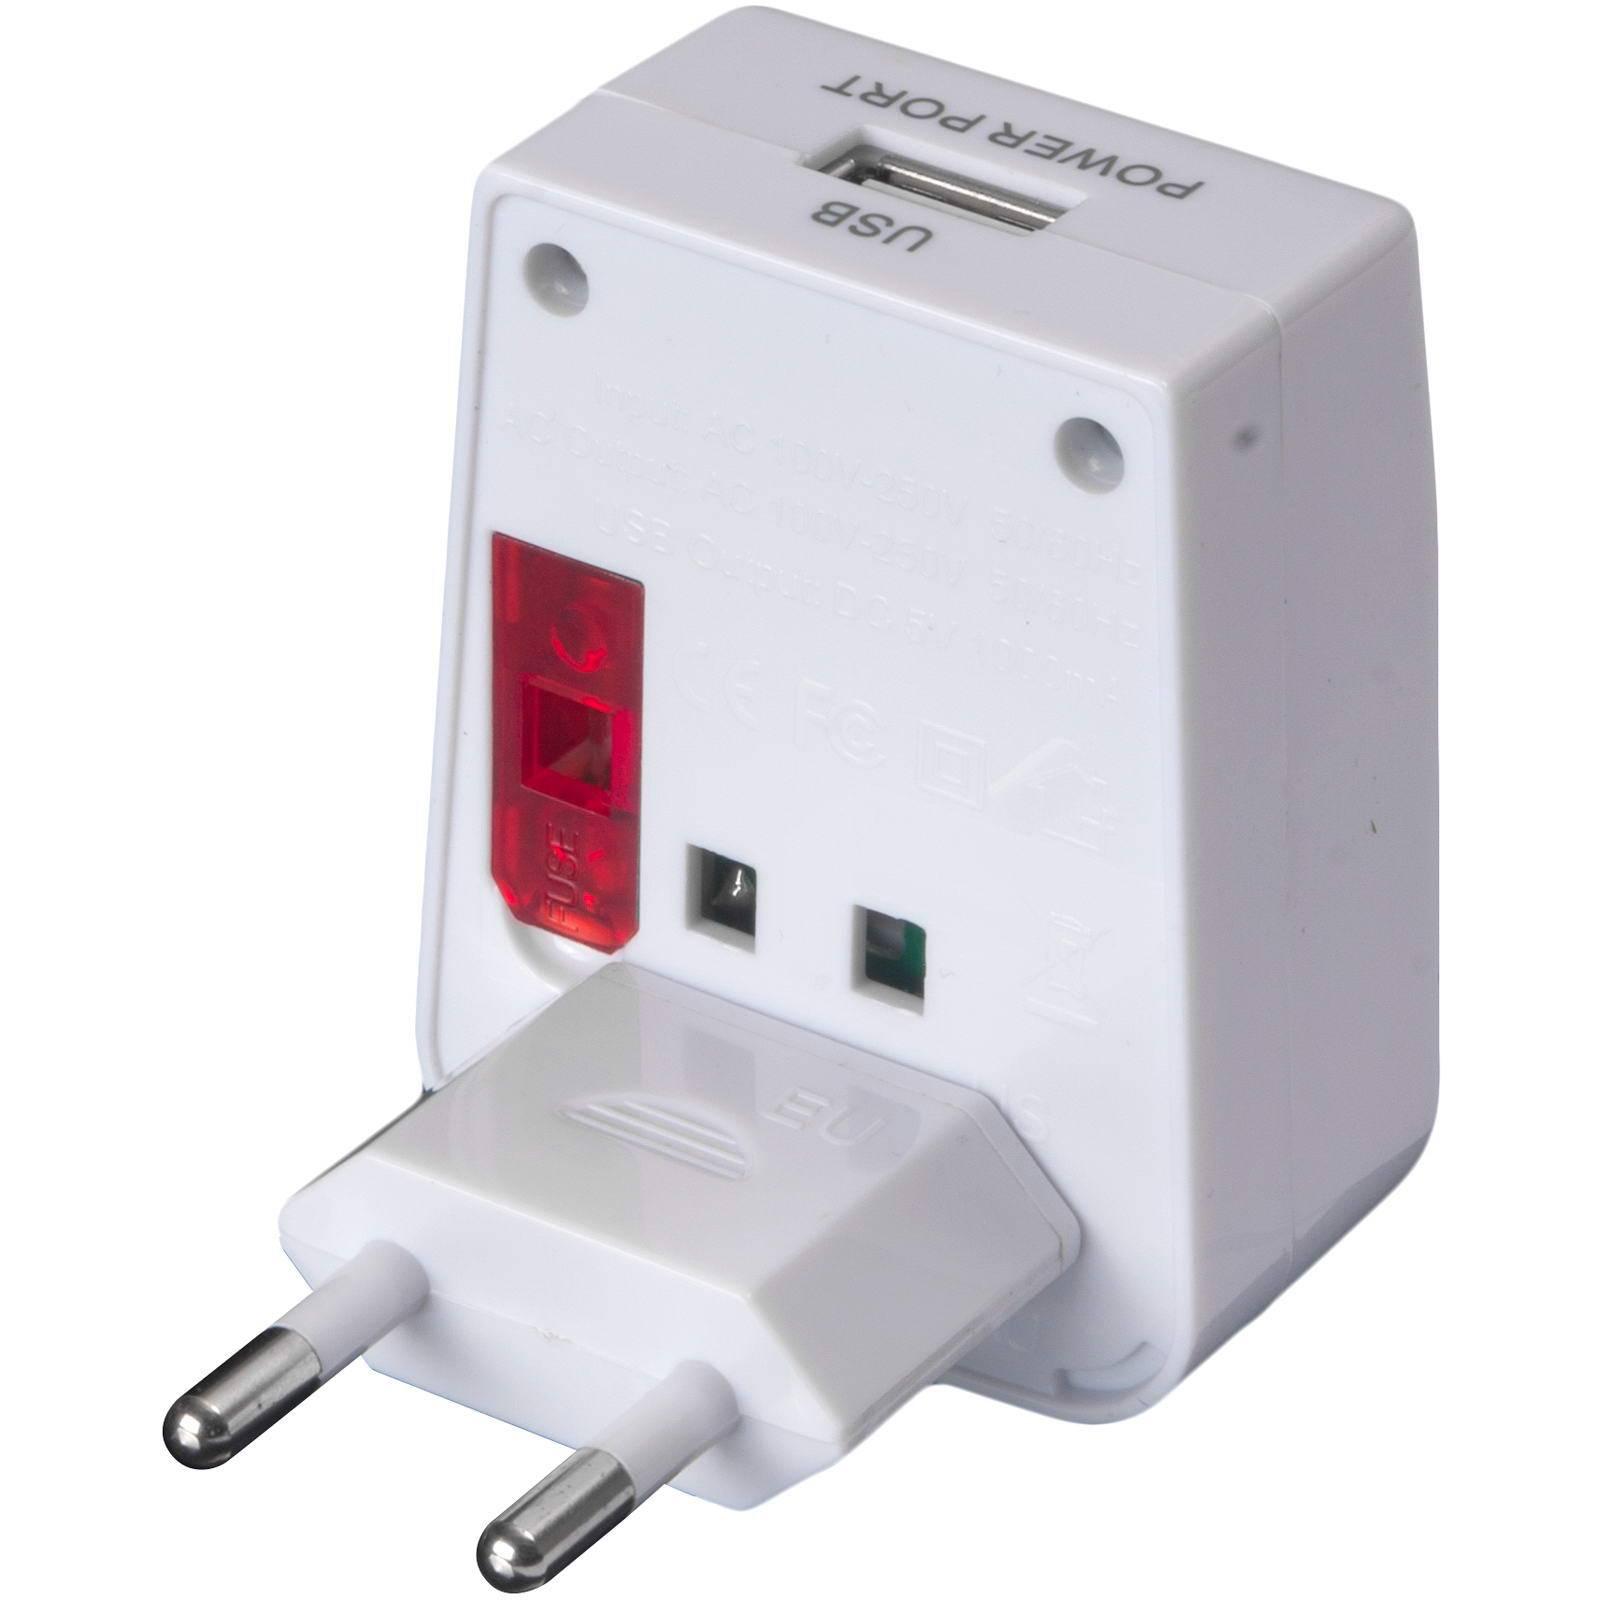 Relags Universal USB Steckeradapter - Bild 7